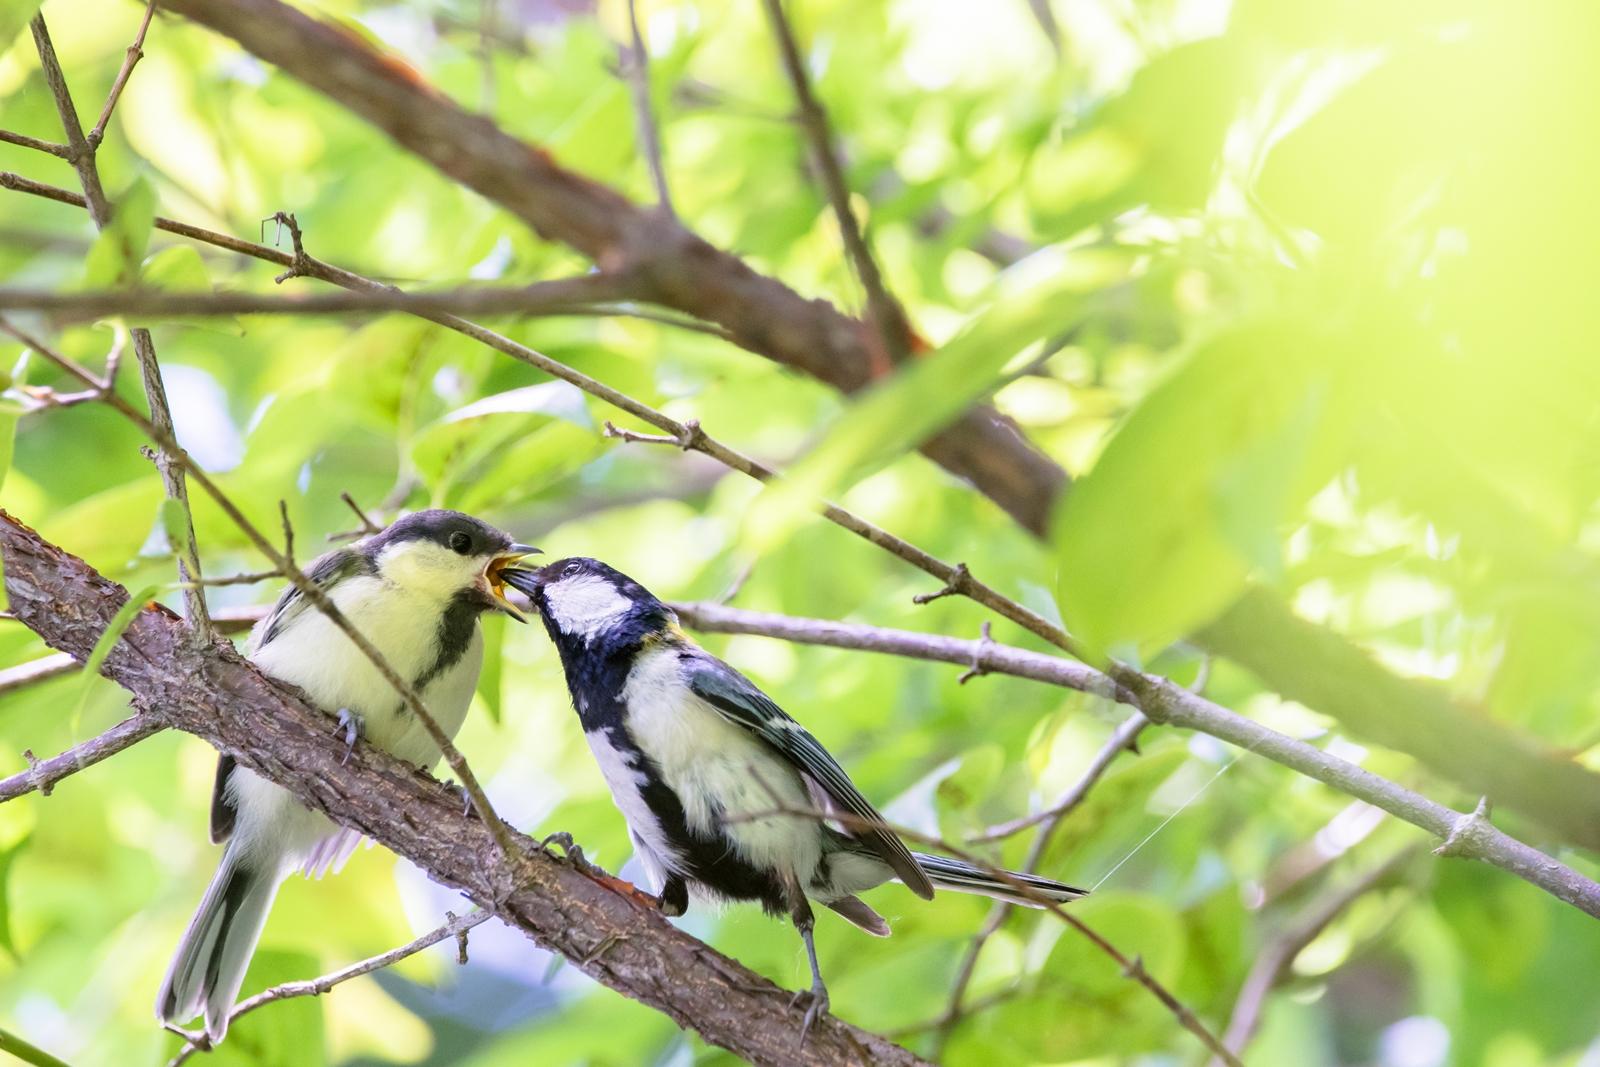 Photo: 「親から子へ」 / Passed on from parents to offspring.  疲れも忘れ 羽も痛み汚れても ただ純粋に愛情を運ぶ 親から子へ  Japanese Tit. (シジュウカラ)  Nikon D500 SIGMA 150-600mm F5-6.3 DG OS HSM Contemporary  #birdphotography #birds #kawaii #ことり #小鳥 #nikon #sigma  ( http://takafumiooshio.com/archives/2736 )